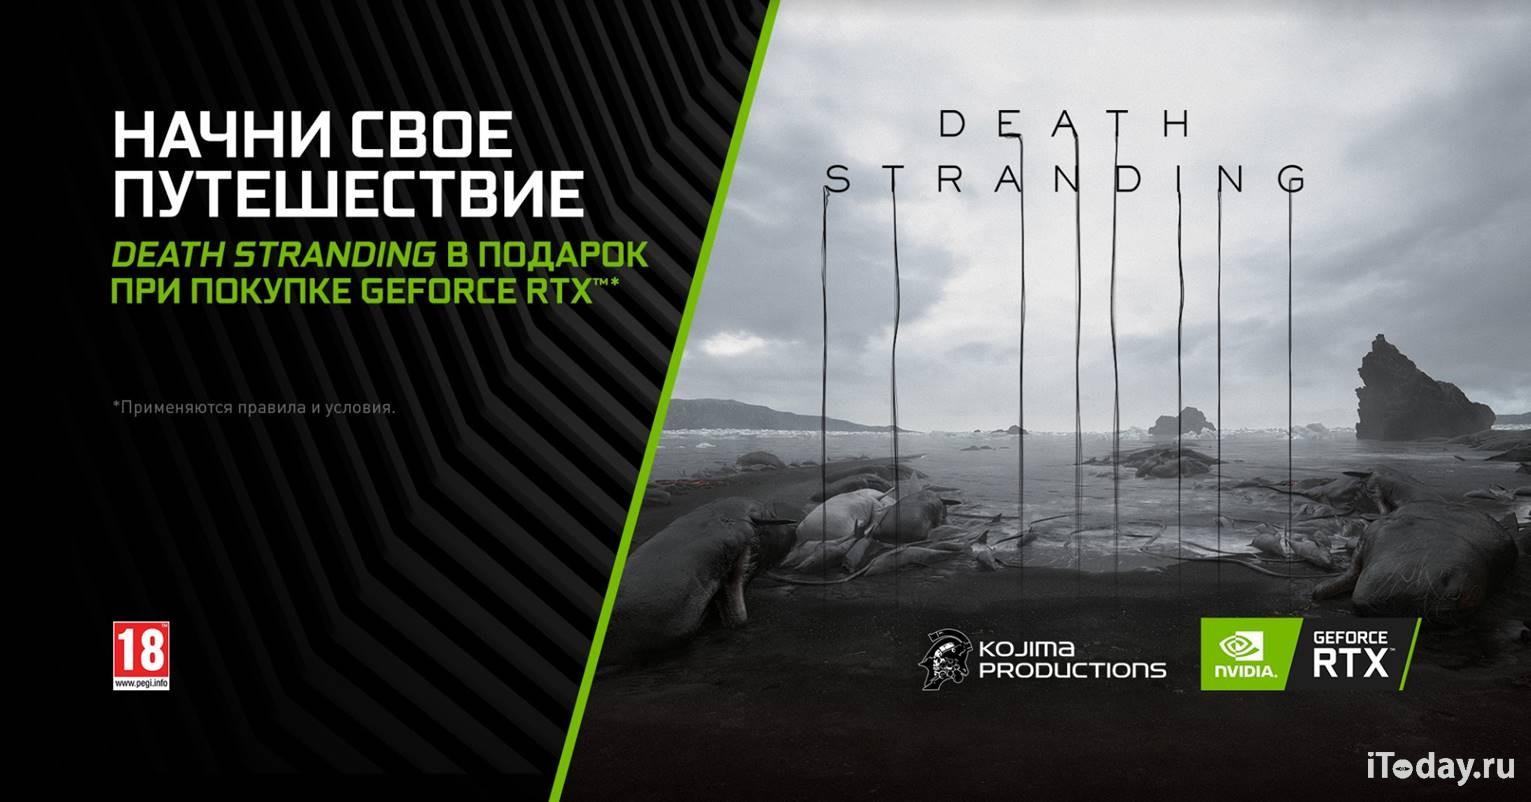 GeForce RTX и игра DEATH STRANDING